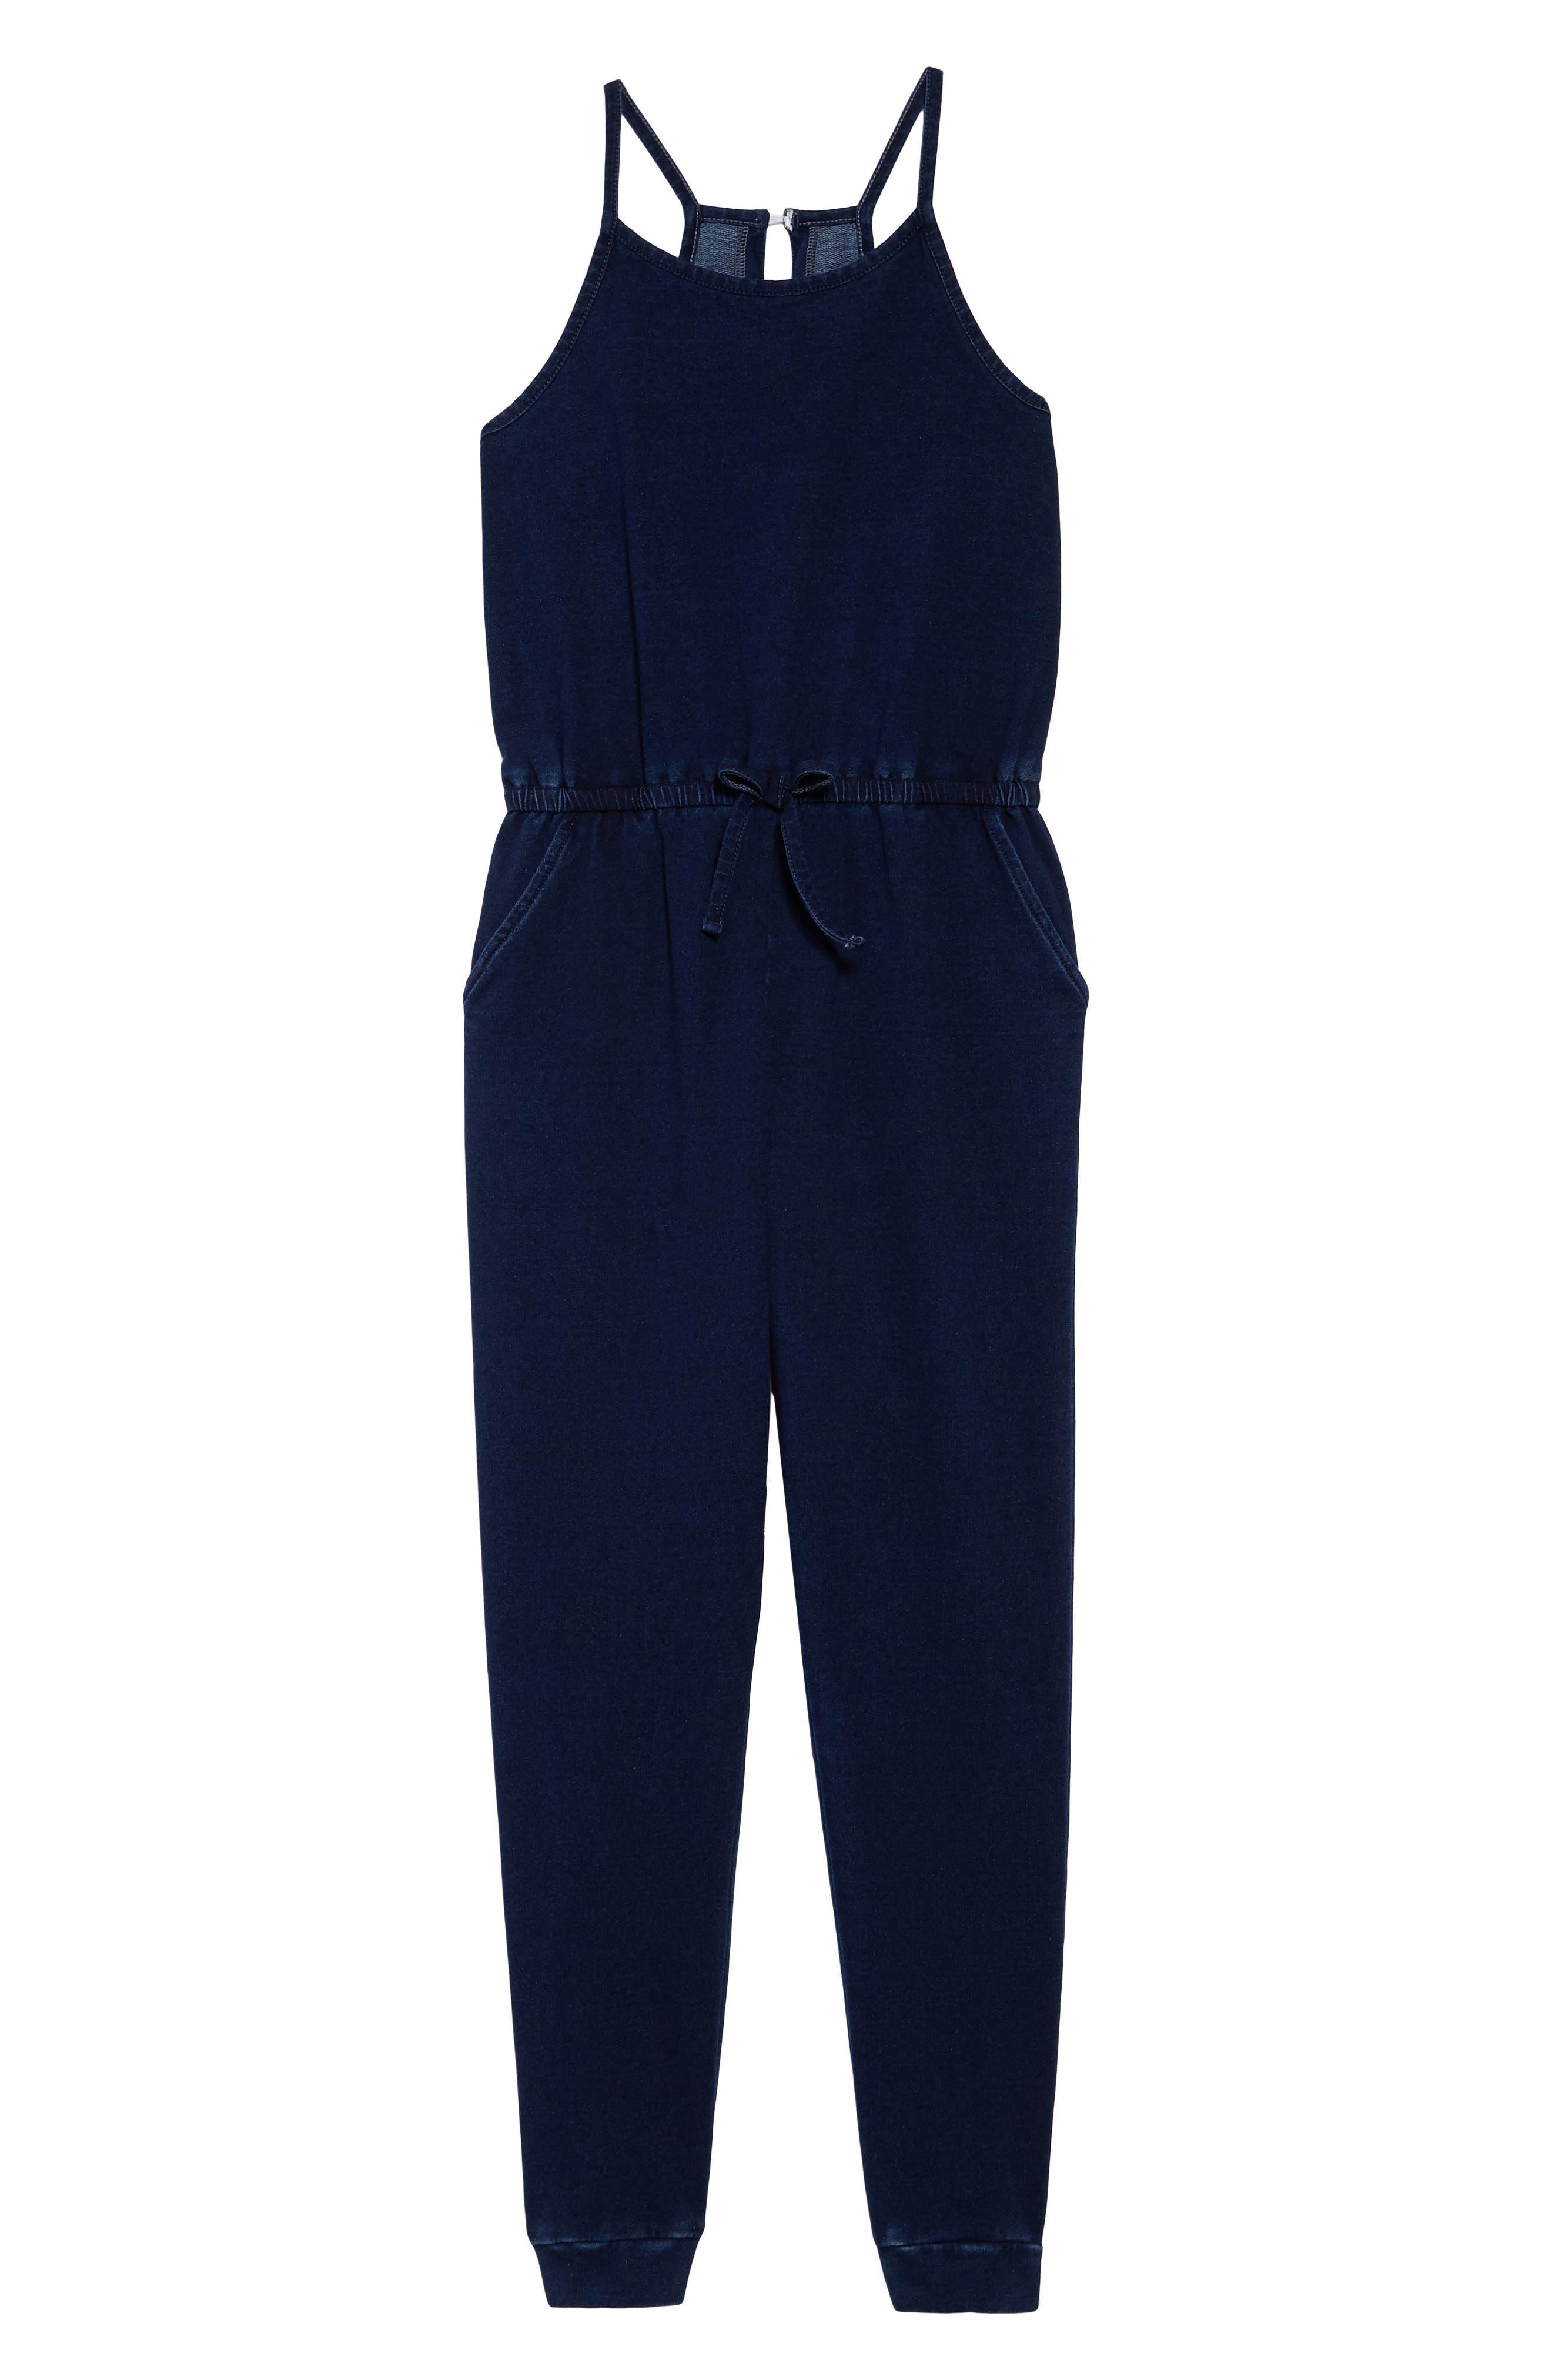 Girls Habitual Kids Lorrie Jumpsuit Size 12  Blue